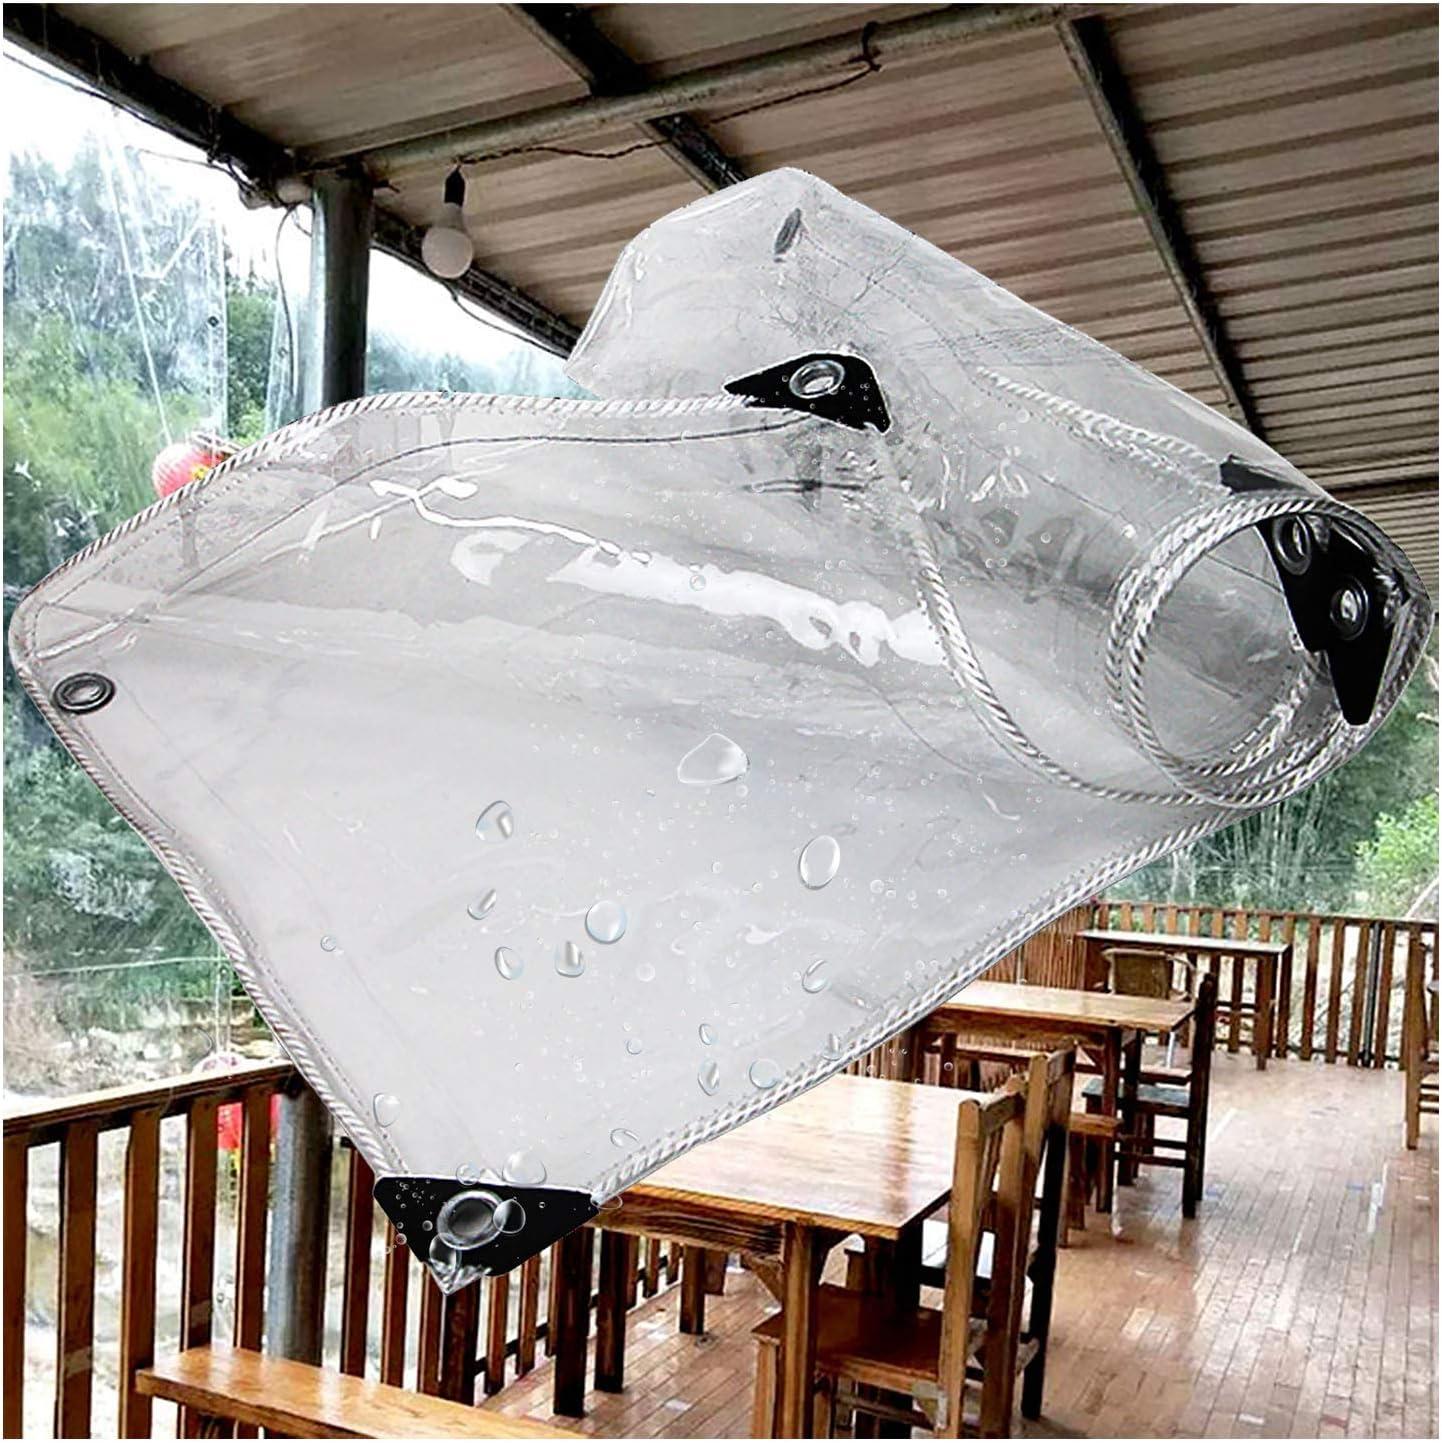 LWZ Waterproof Clear Tarps with Grommets Greenhouse Duty online shop Heavy Bombing free shipping